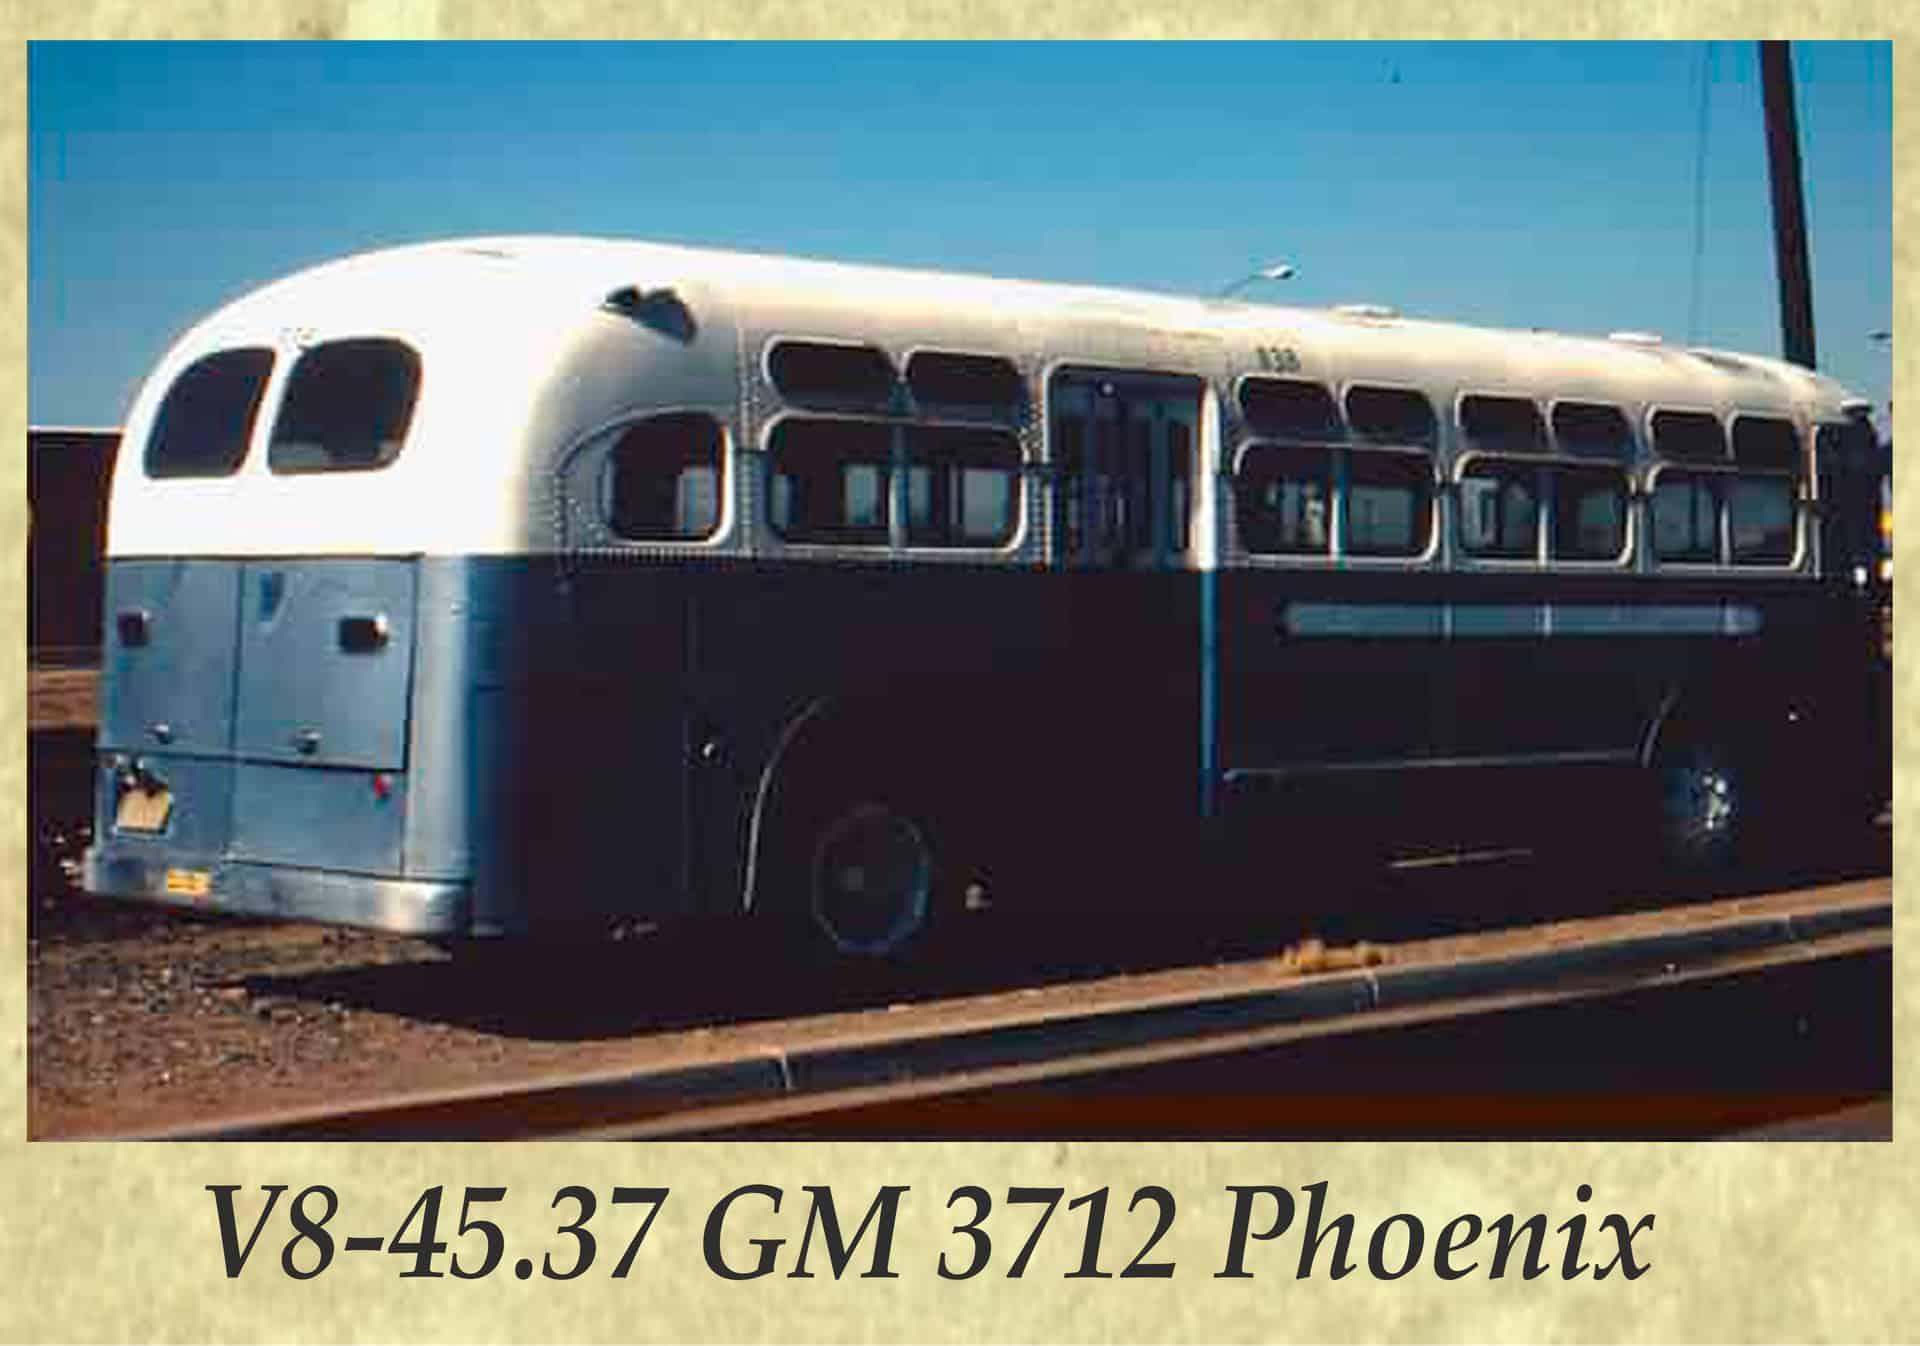 V8-45.37 GM 3712 Phoenix